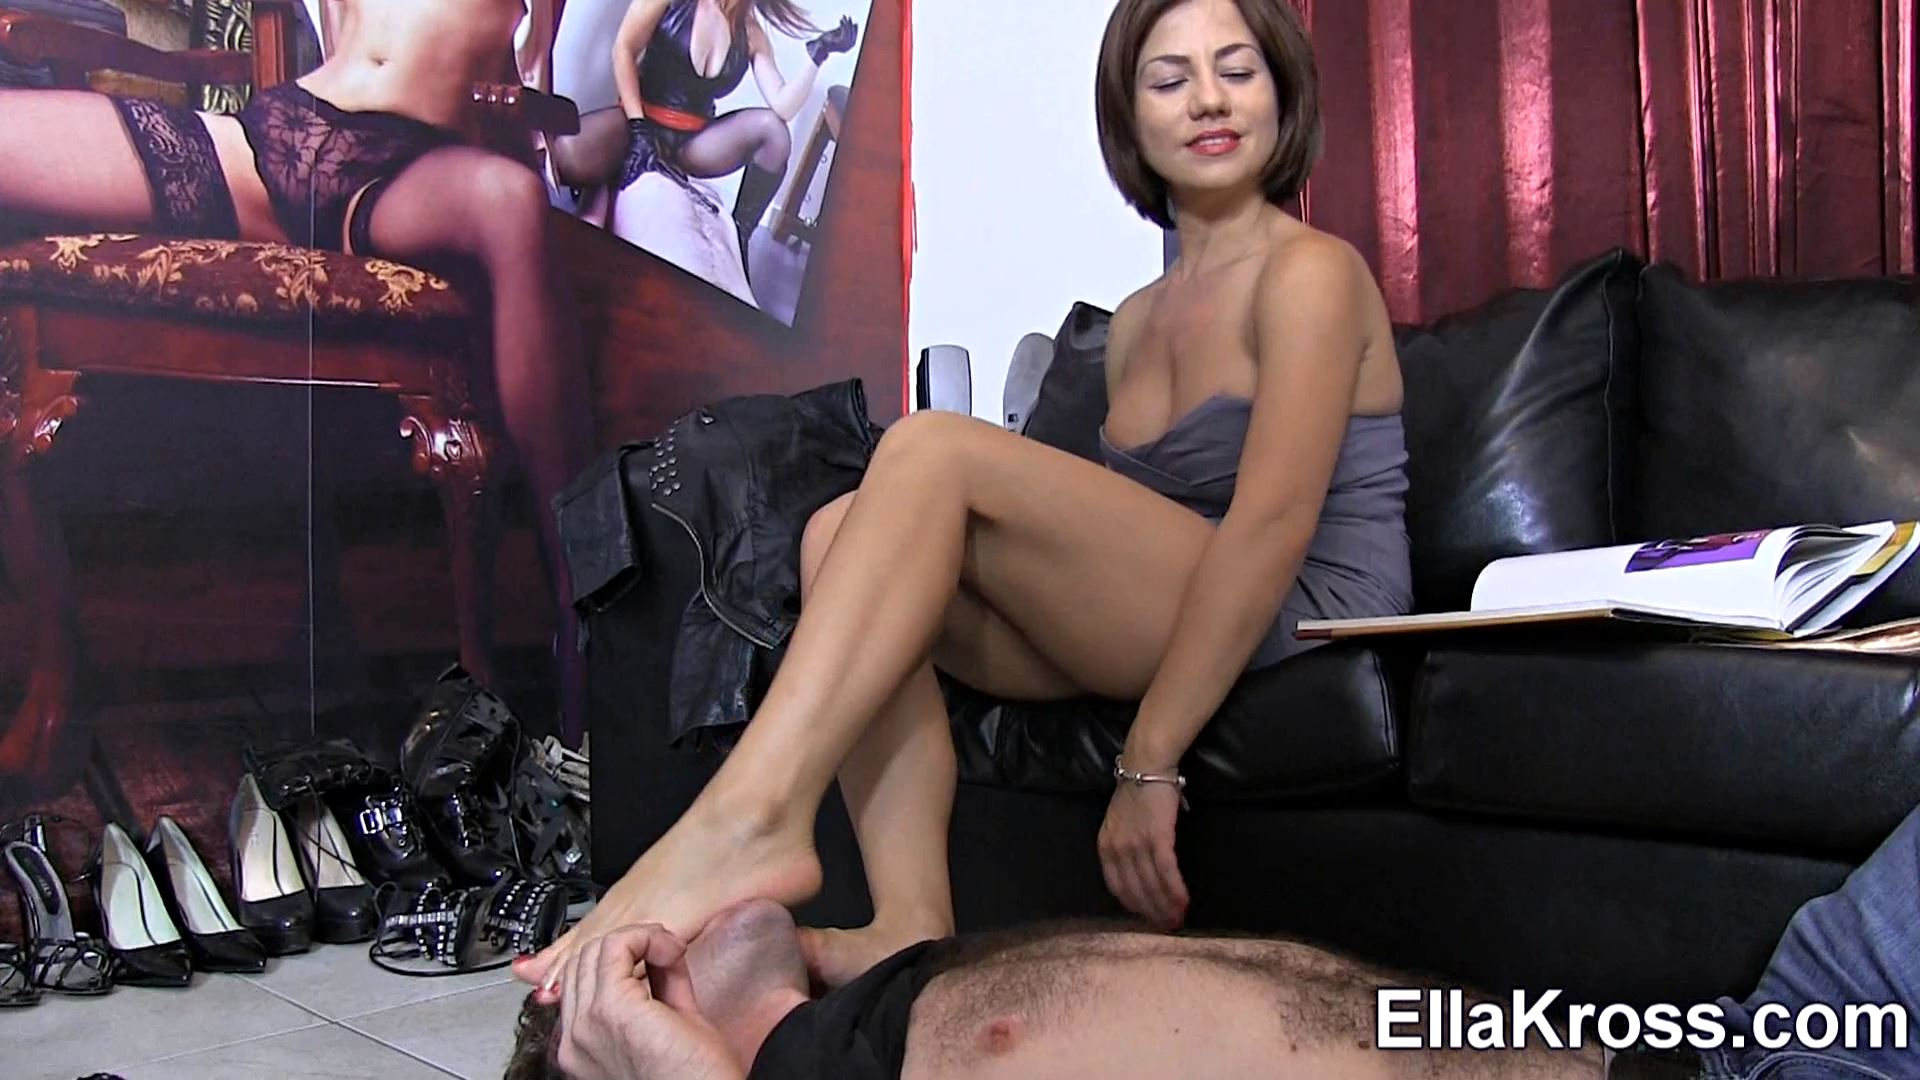 Ella Kross In Scene: Dirty Foot Sucking and Worship - ELLAKROSS - FULL HD/1080p/MP4